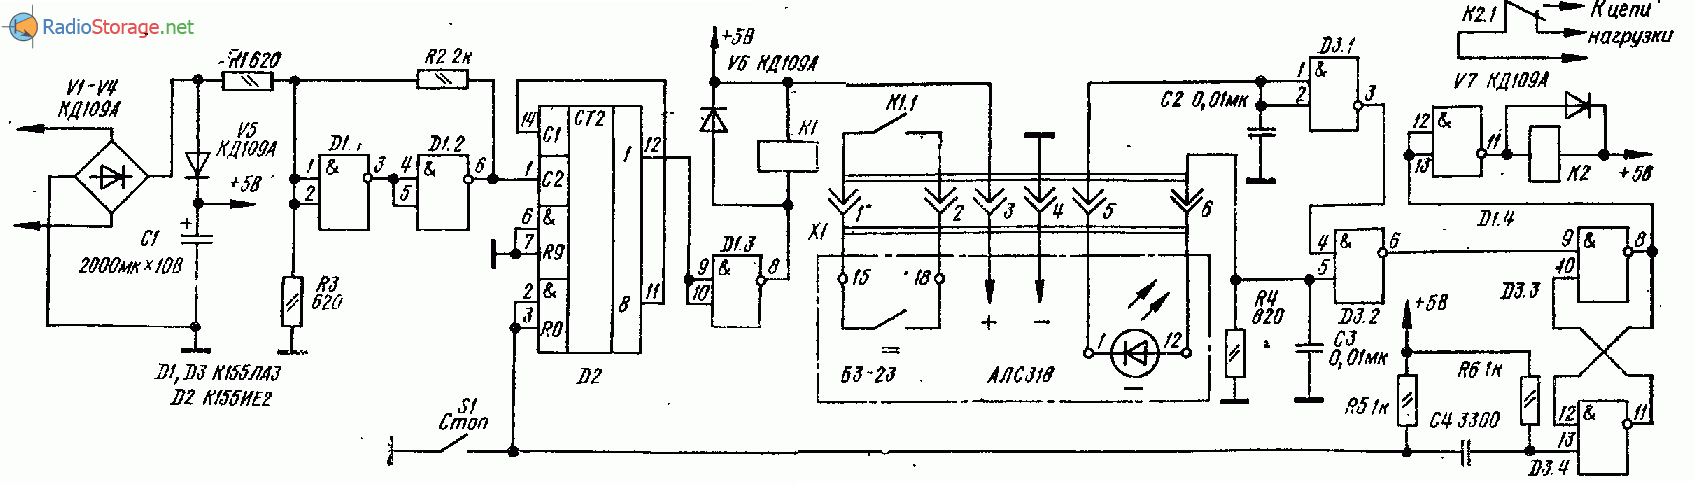 Схема приставки - секундомера к микрокалькулятору